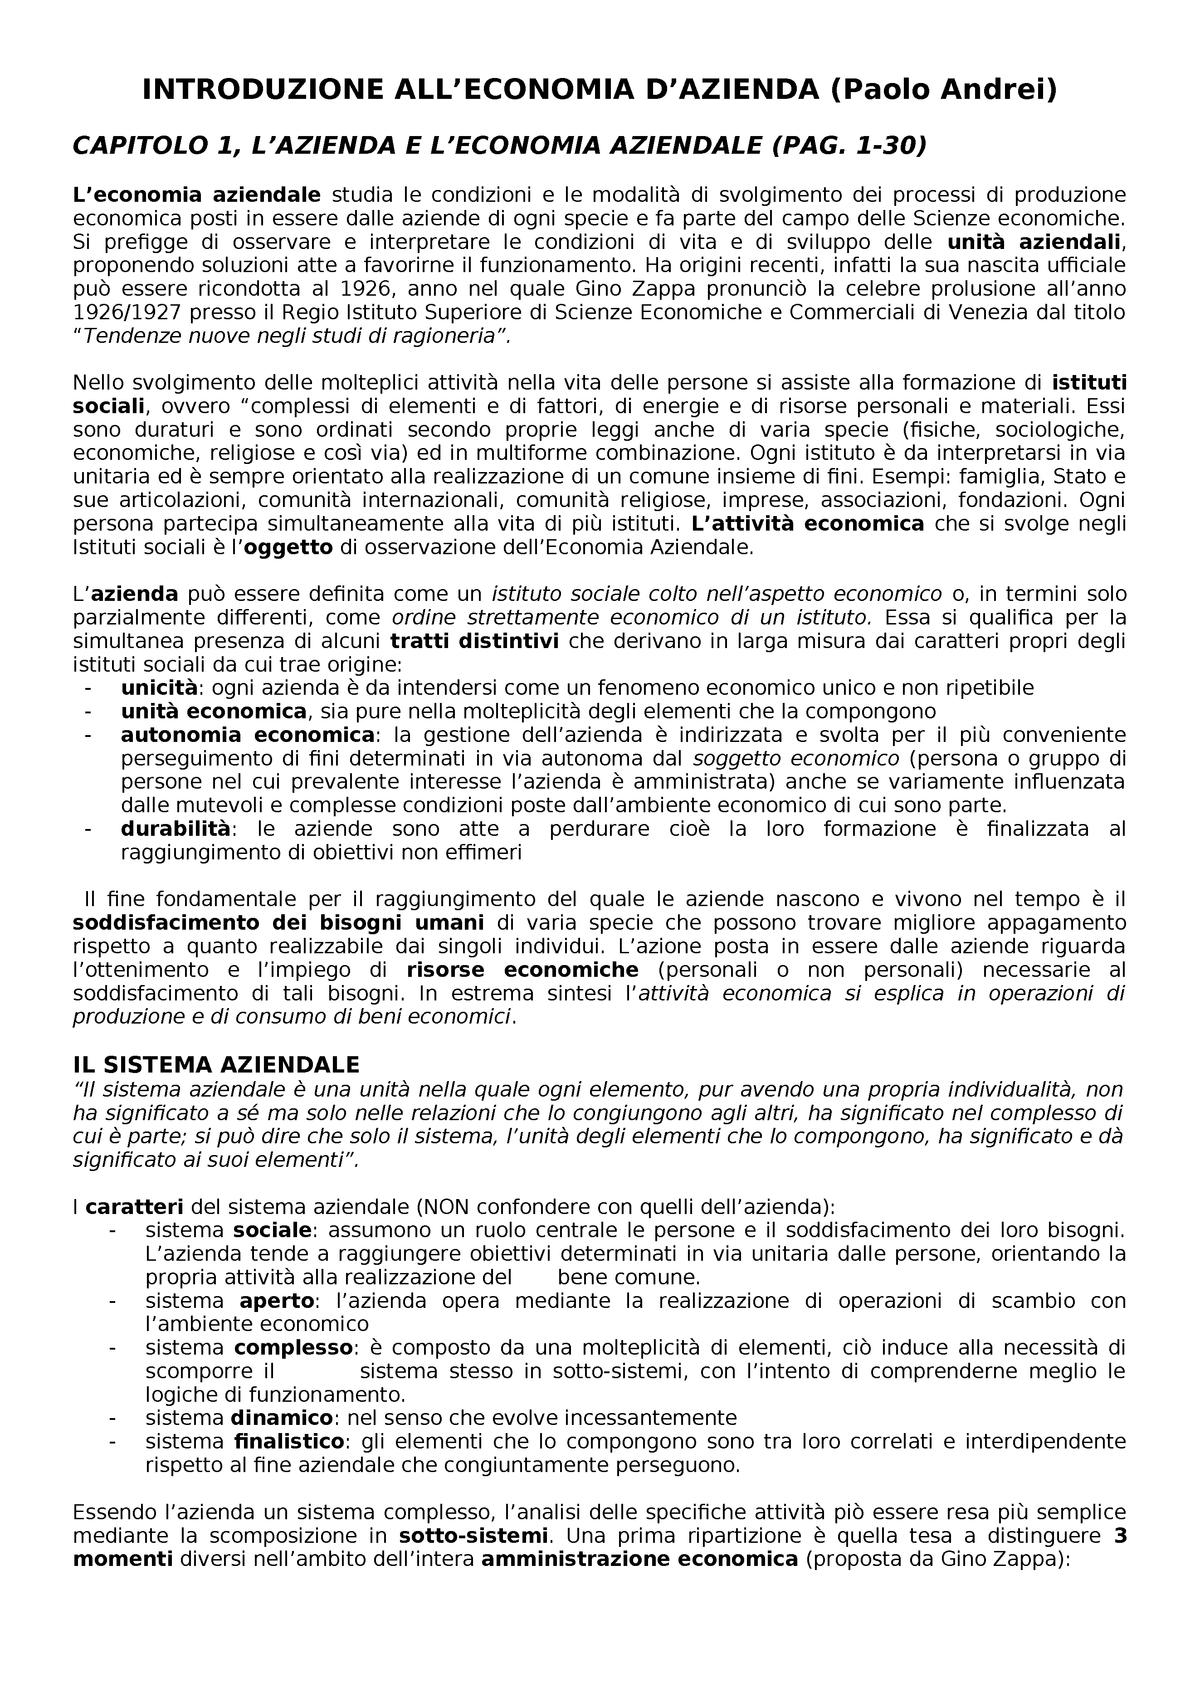 a0f2819cc3 Riassunto Introduzione all'economia d'azienda 25 Apr 2018 - StuDocu